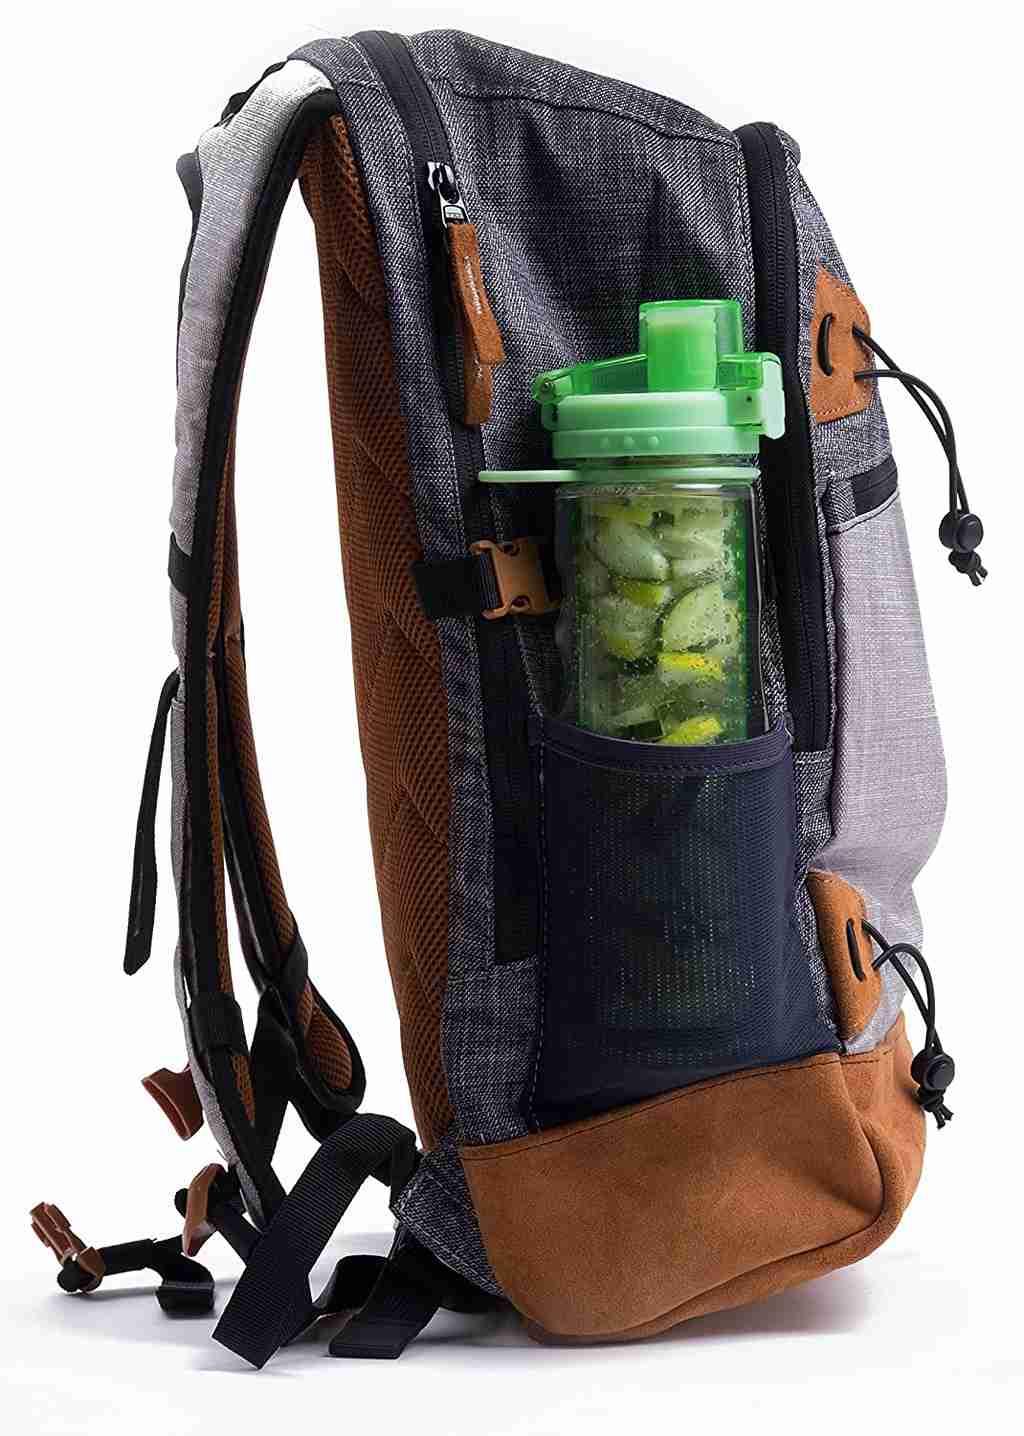 Infuser Water Bottle 25oz - Aqua Green - Bag